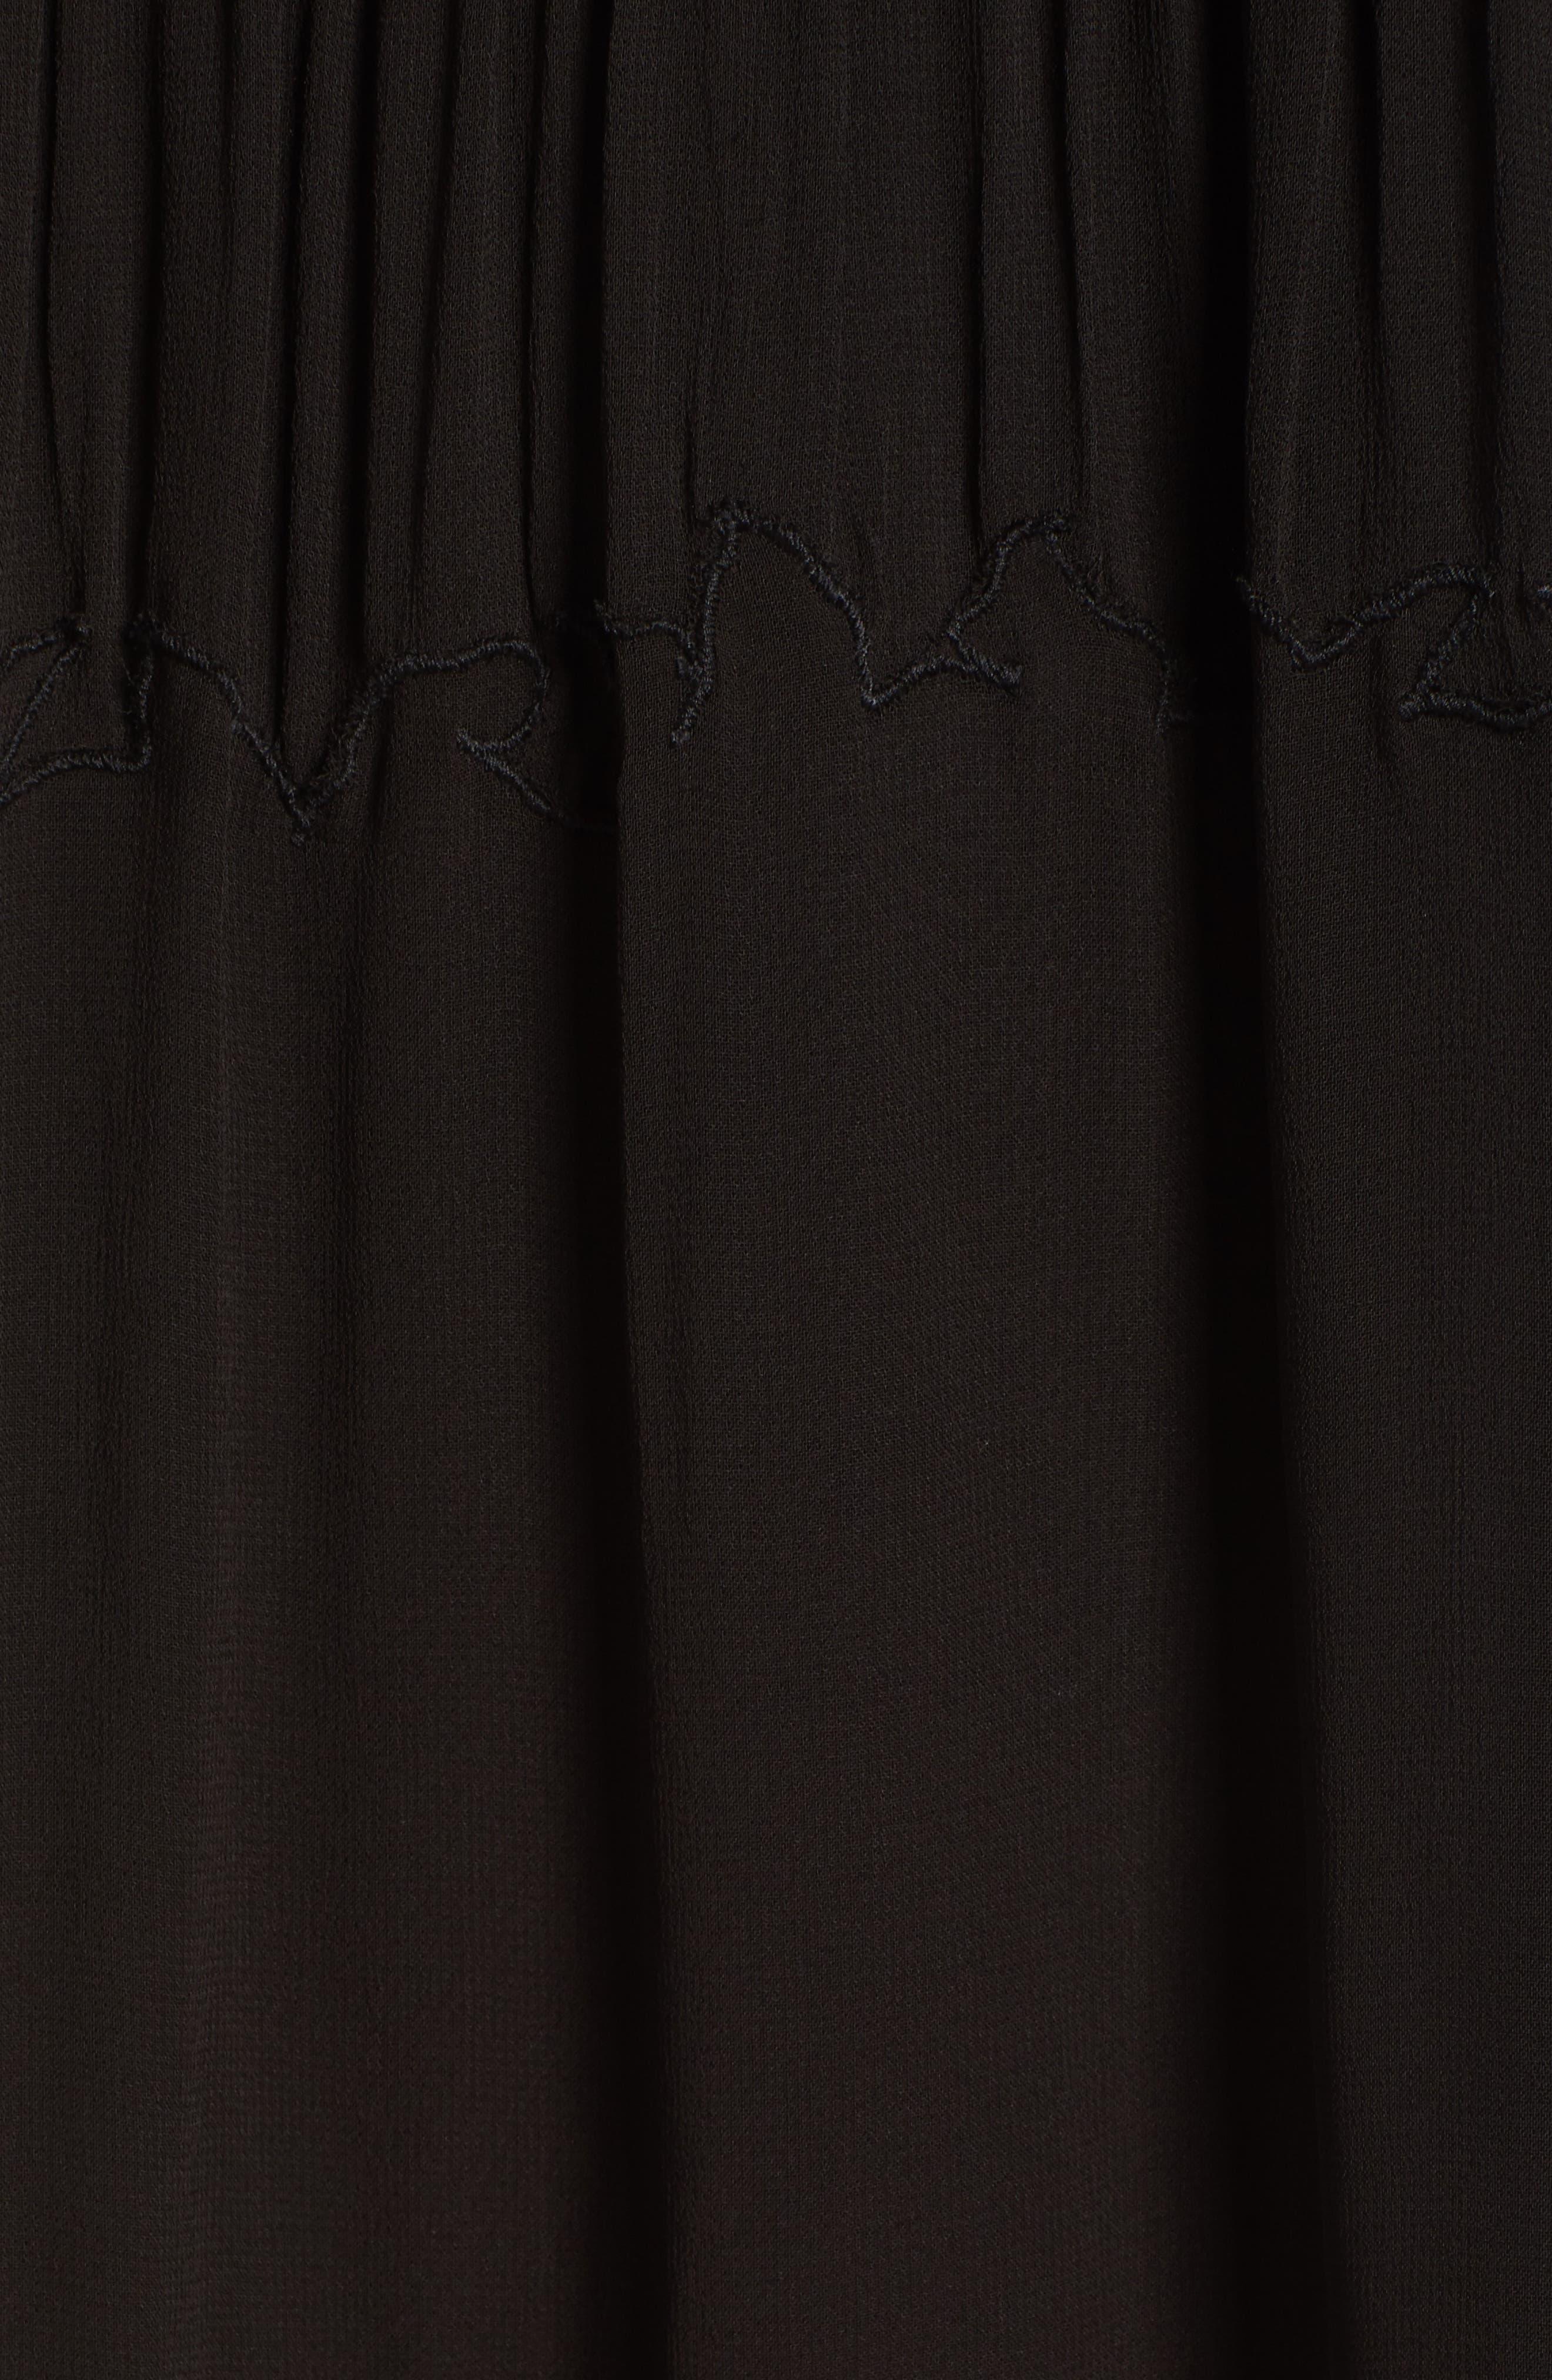 Laos Chiffon Pintuck Dress,                             Alternate thumbnail 5, color,                             001